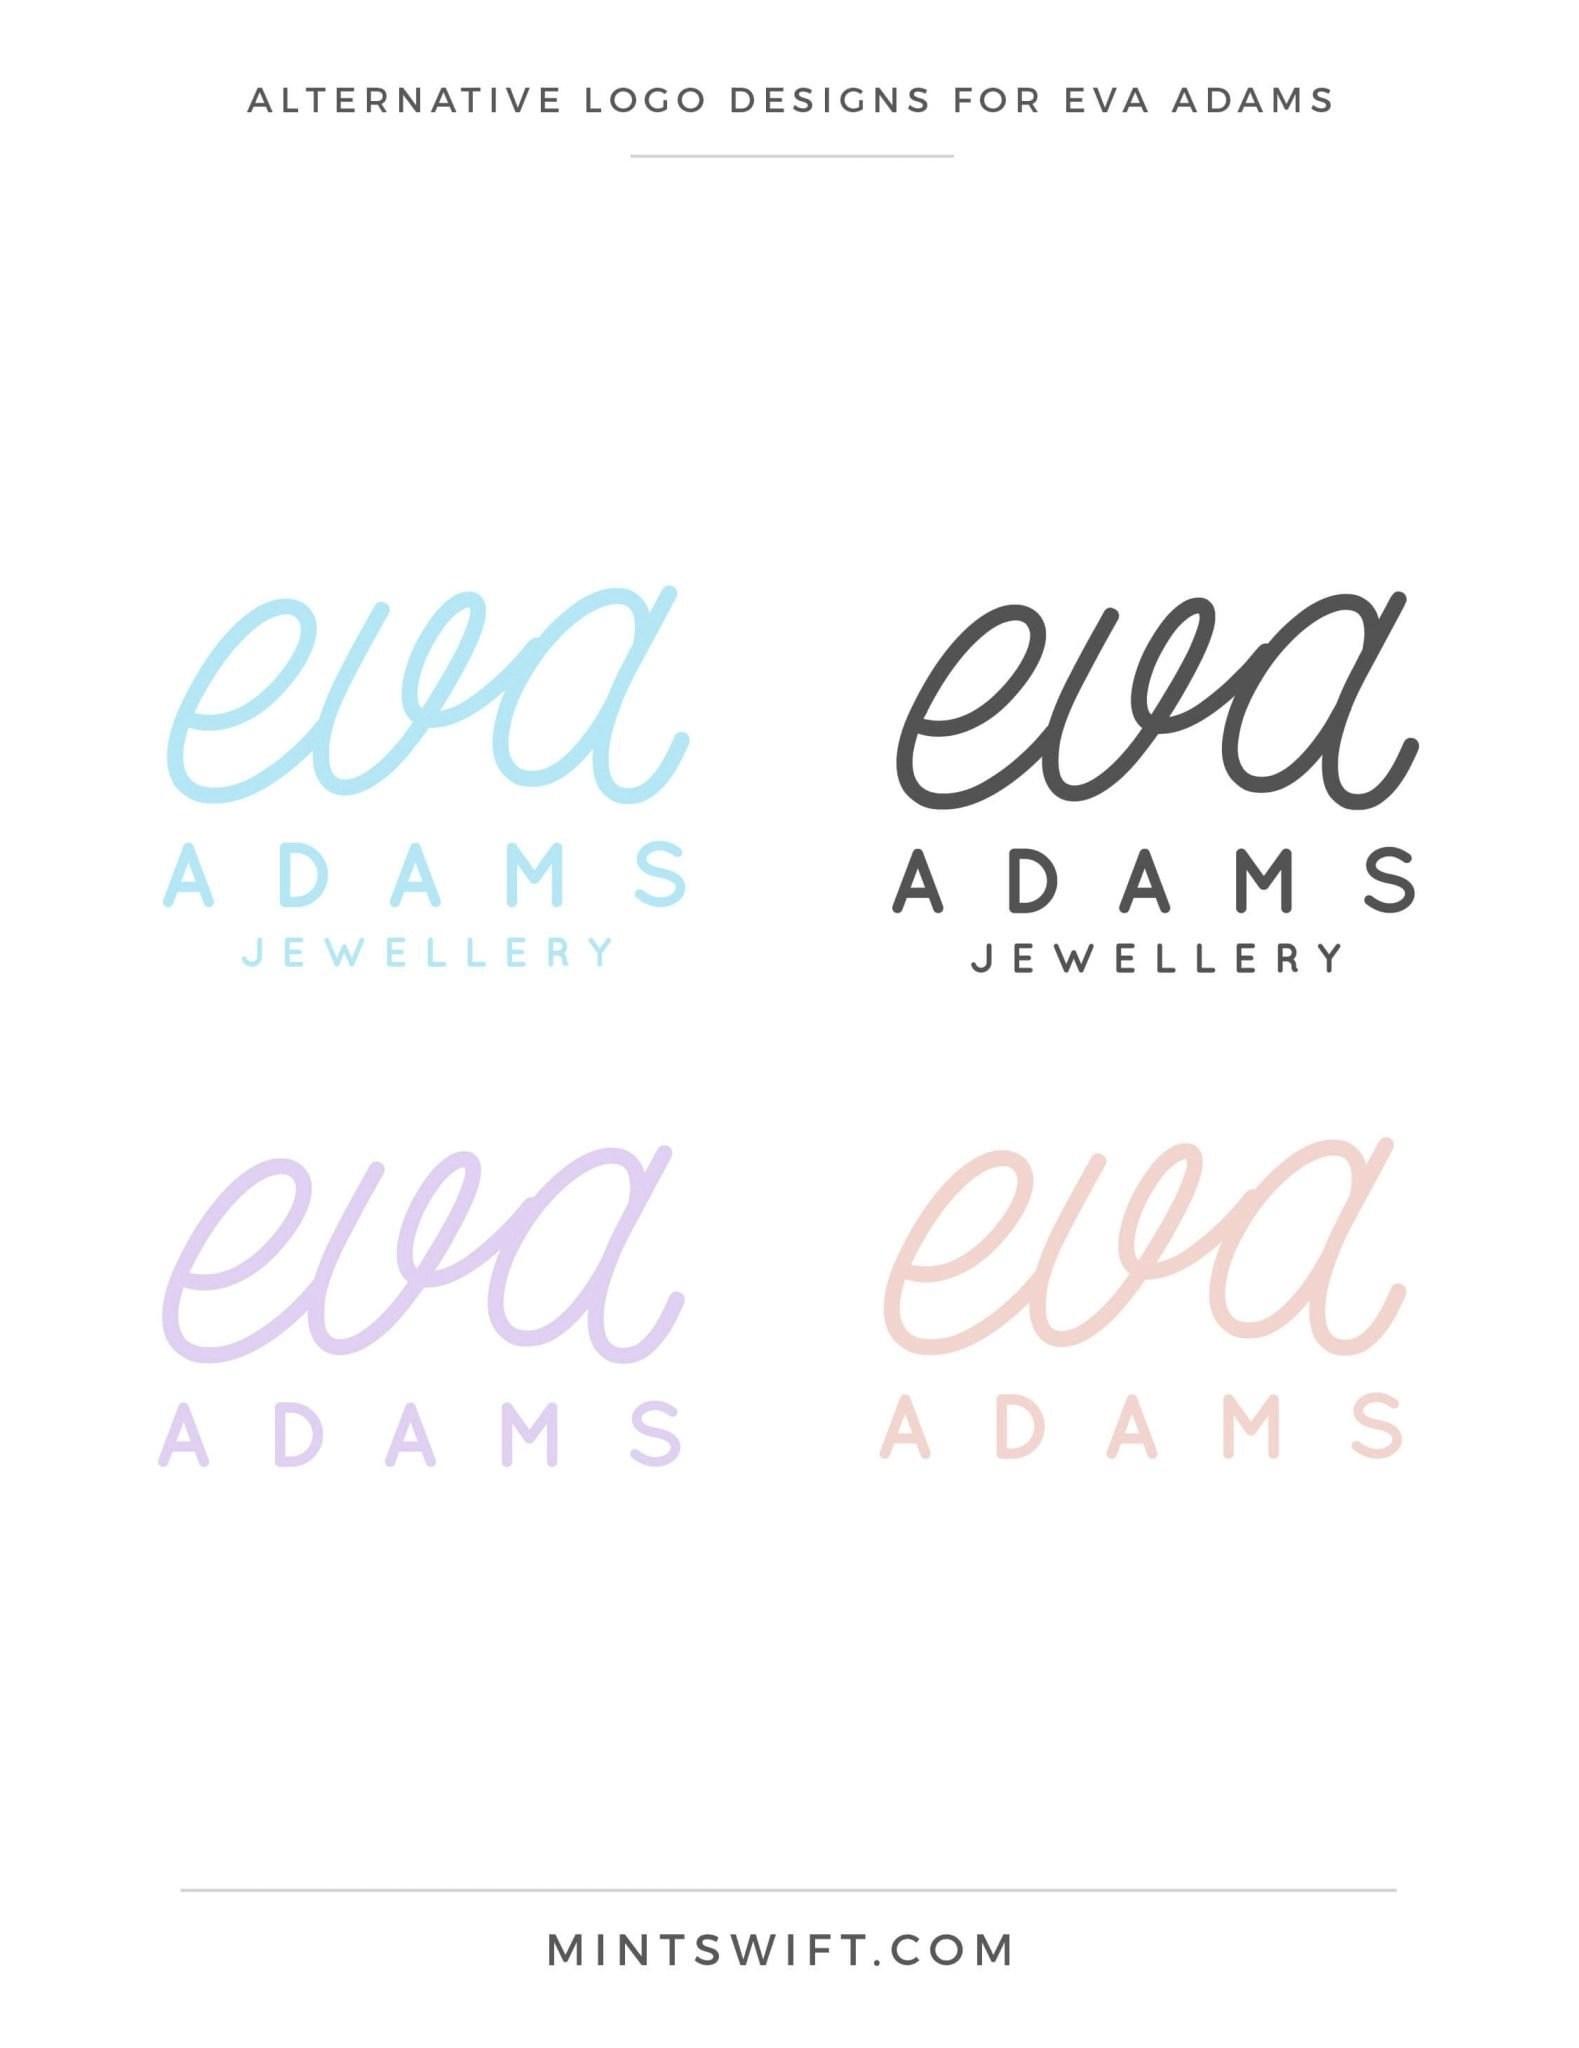 Eva Adams - Alternative logo designs - MintSwift